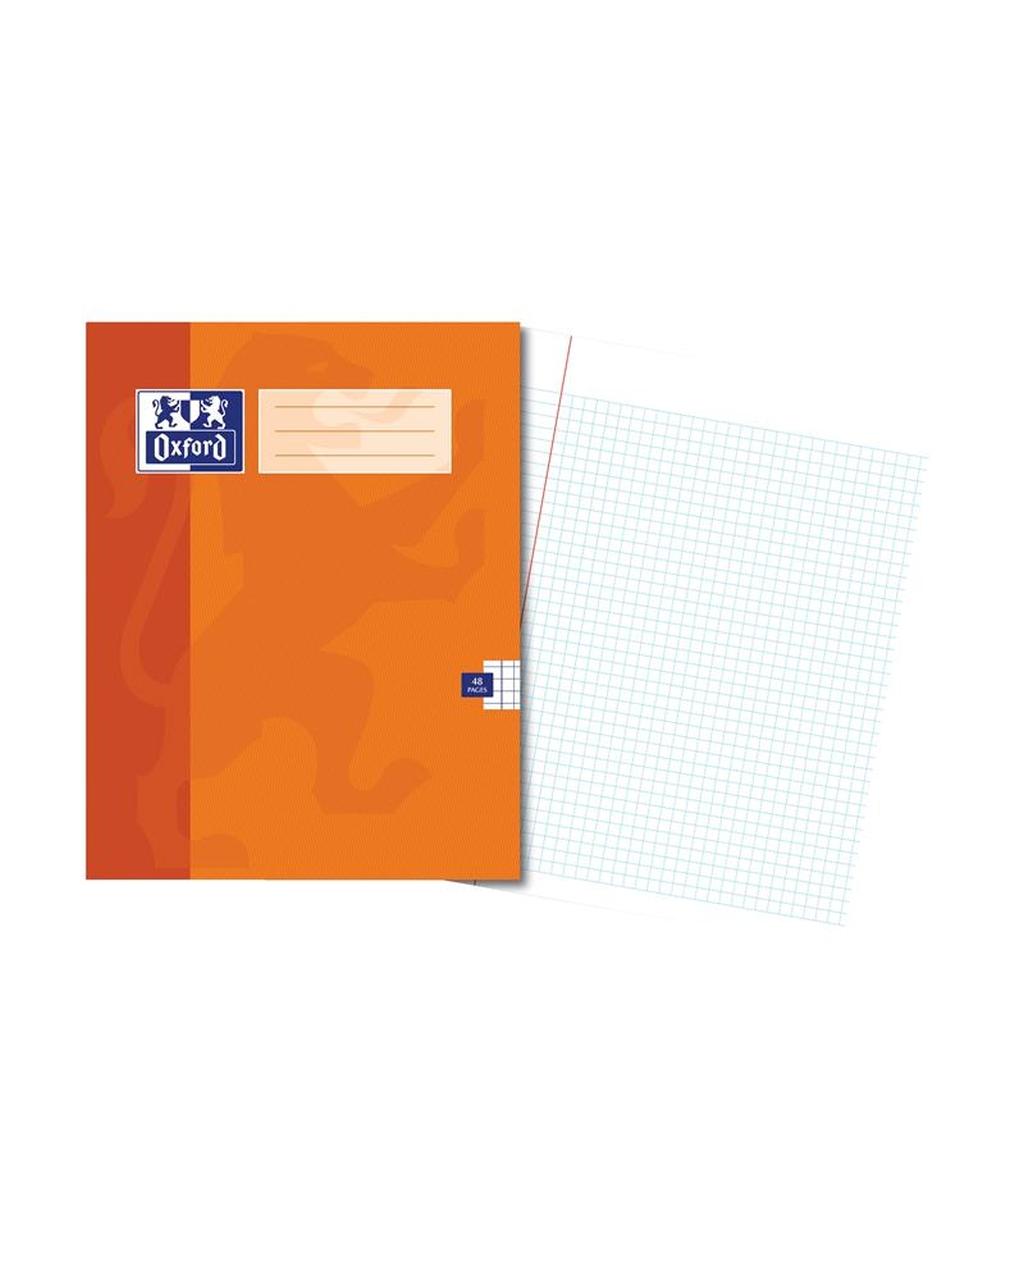 220x170 Oxford Ex Bk 48Pg 5Mm Sq Orange